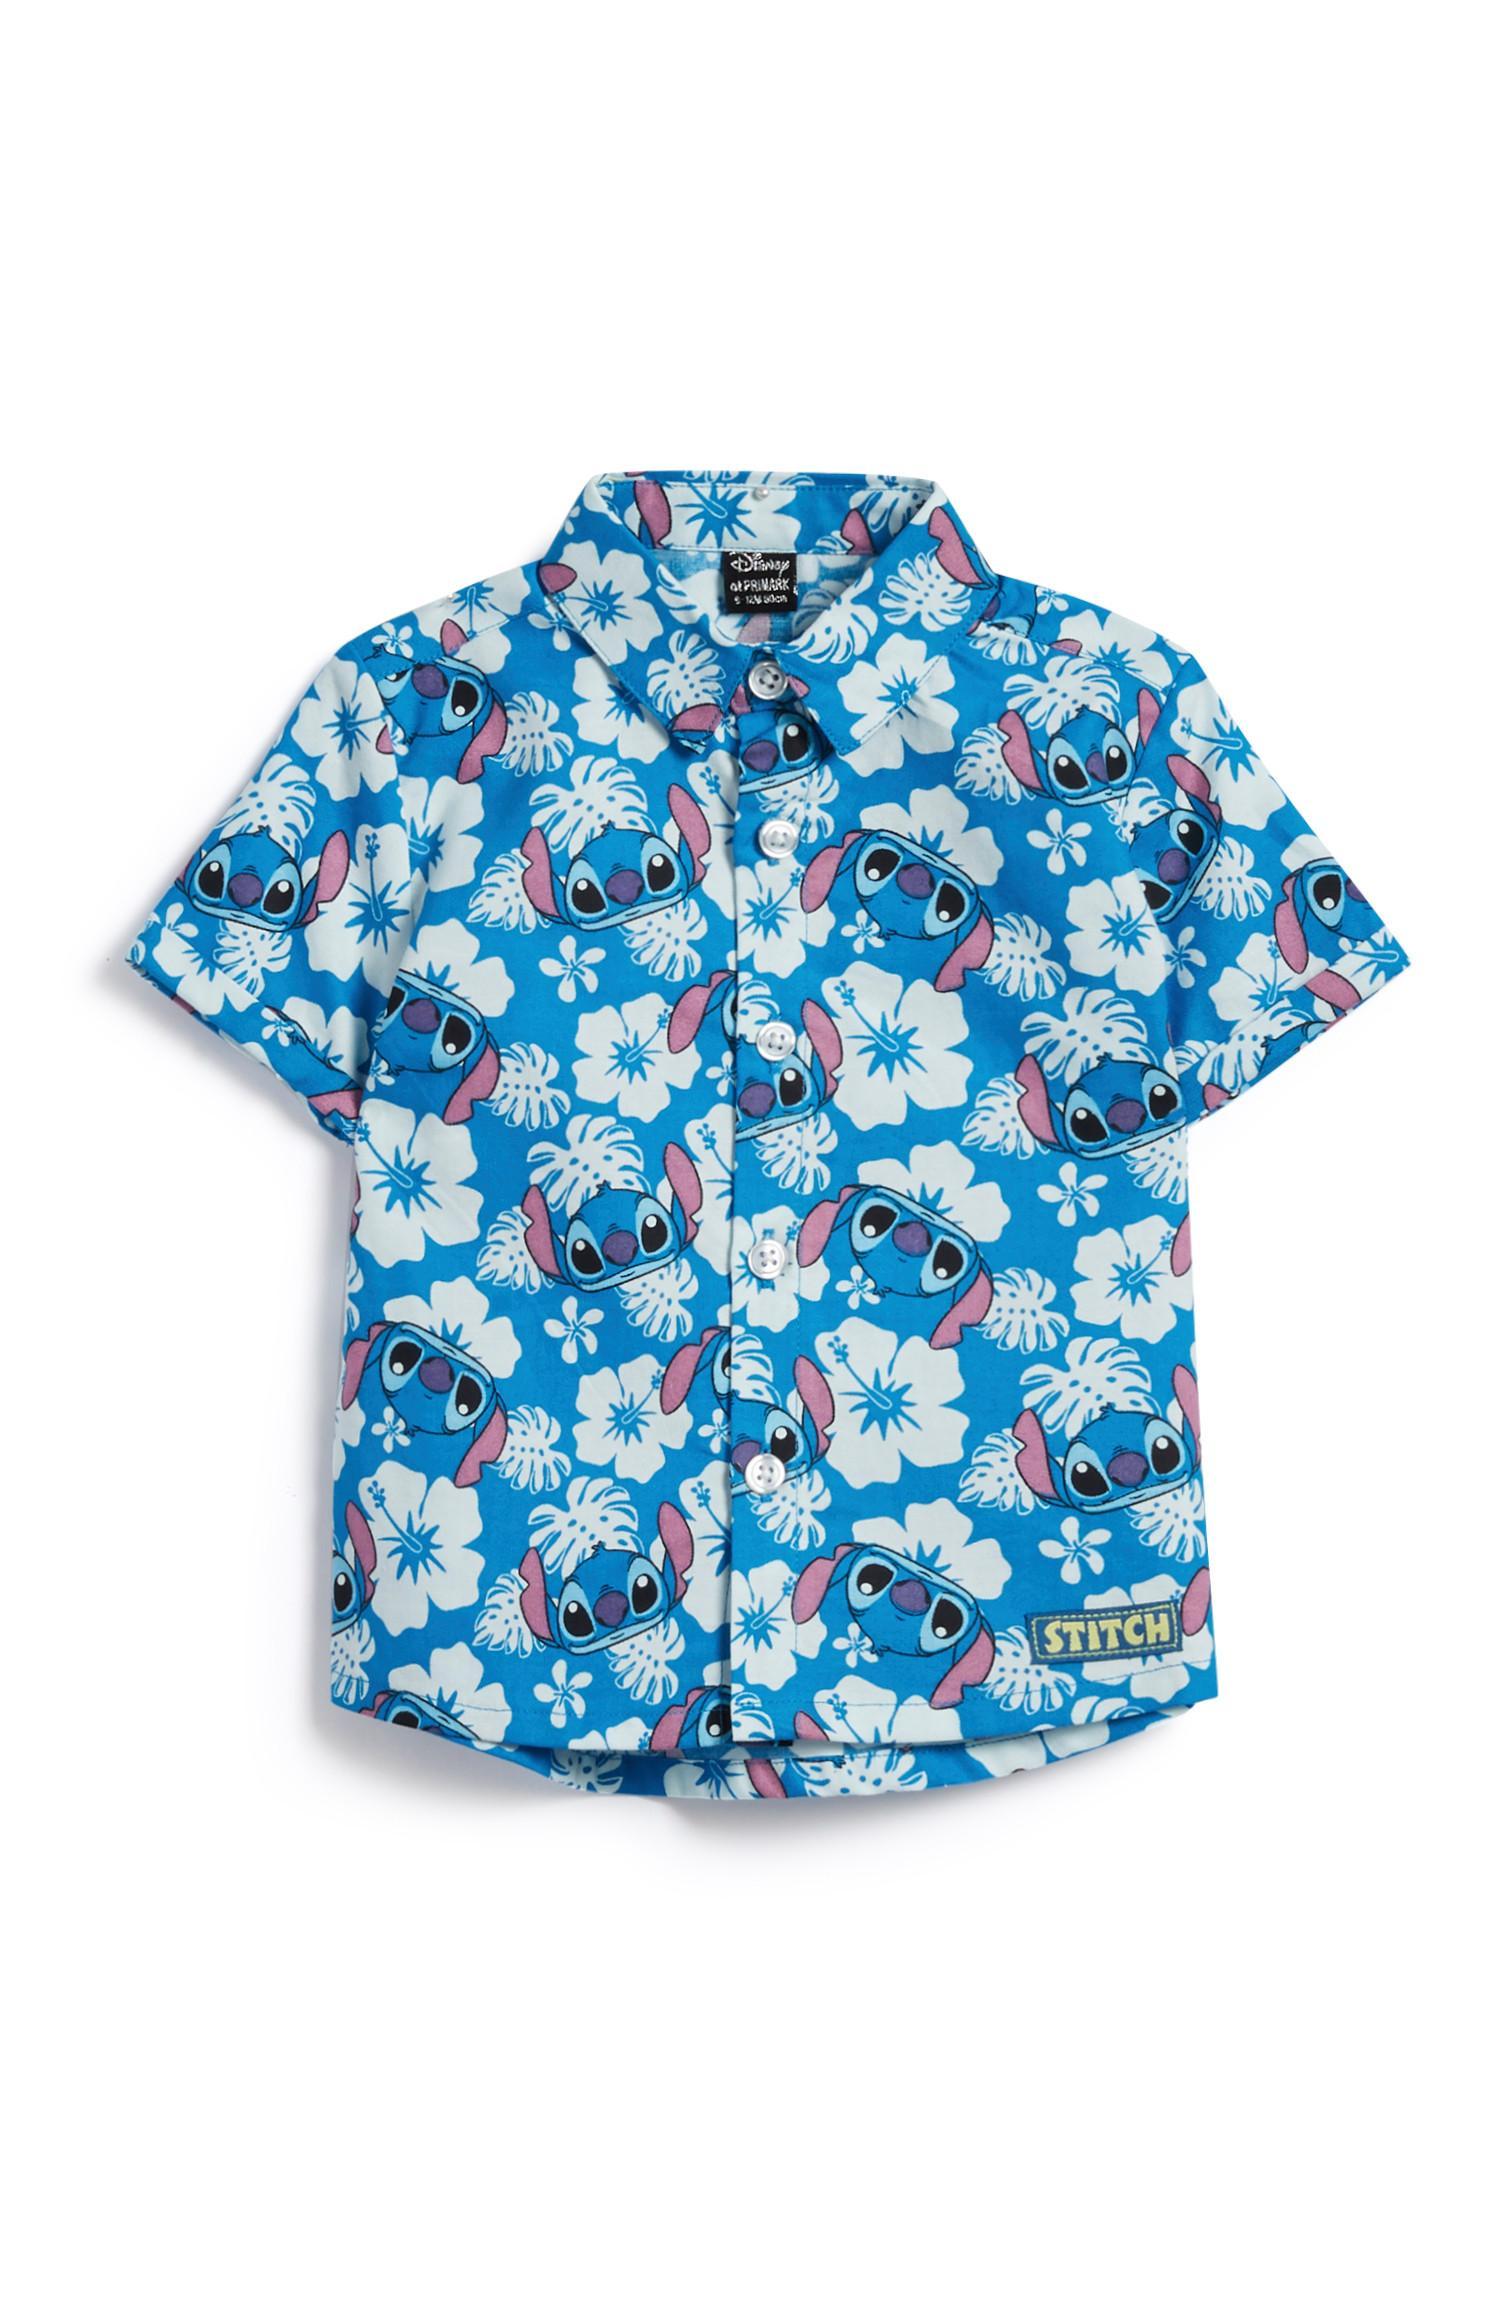 Baby Boy Stitch Shirt